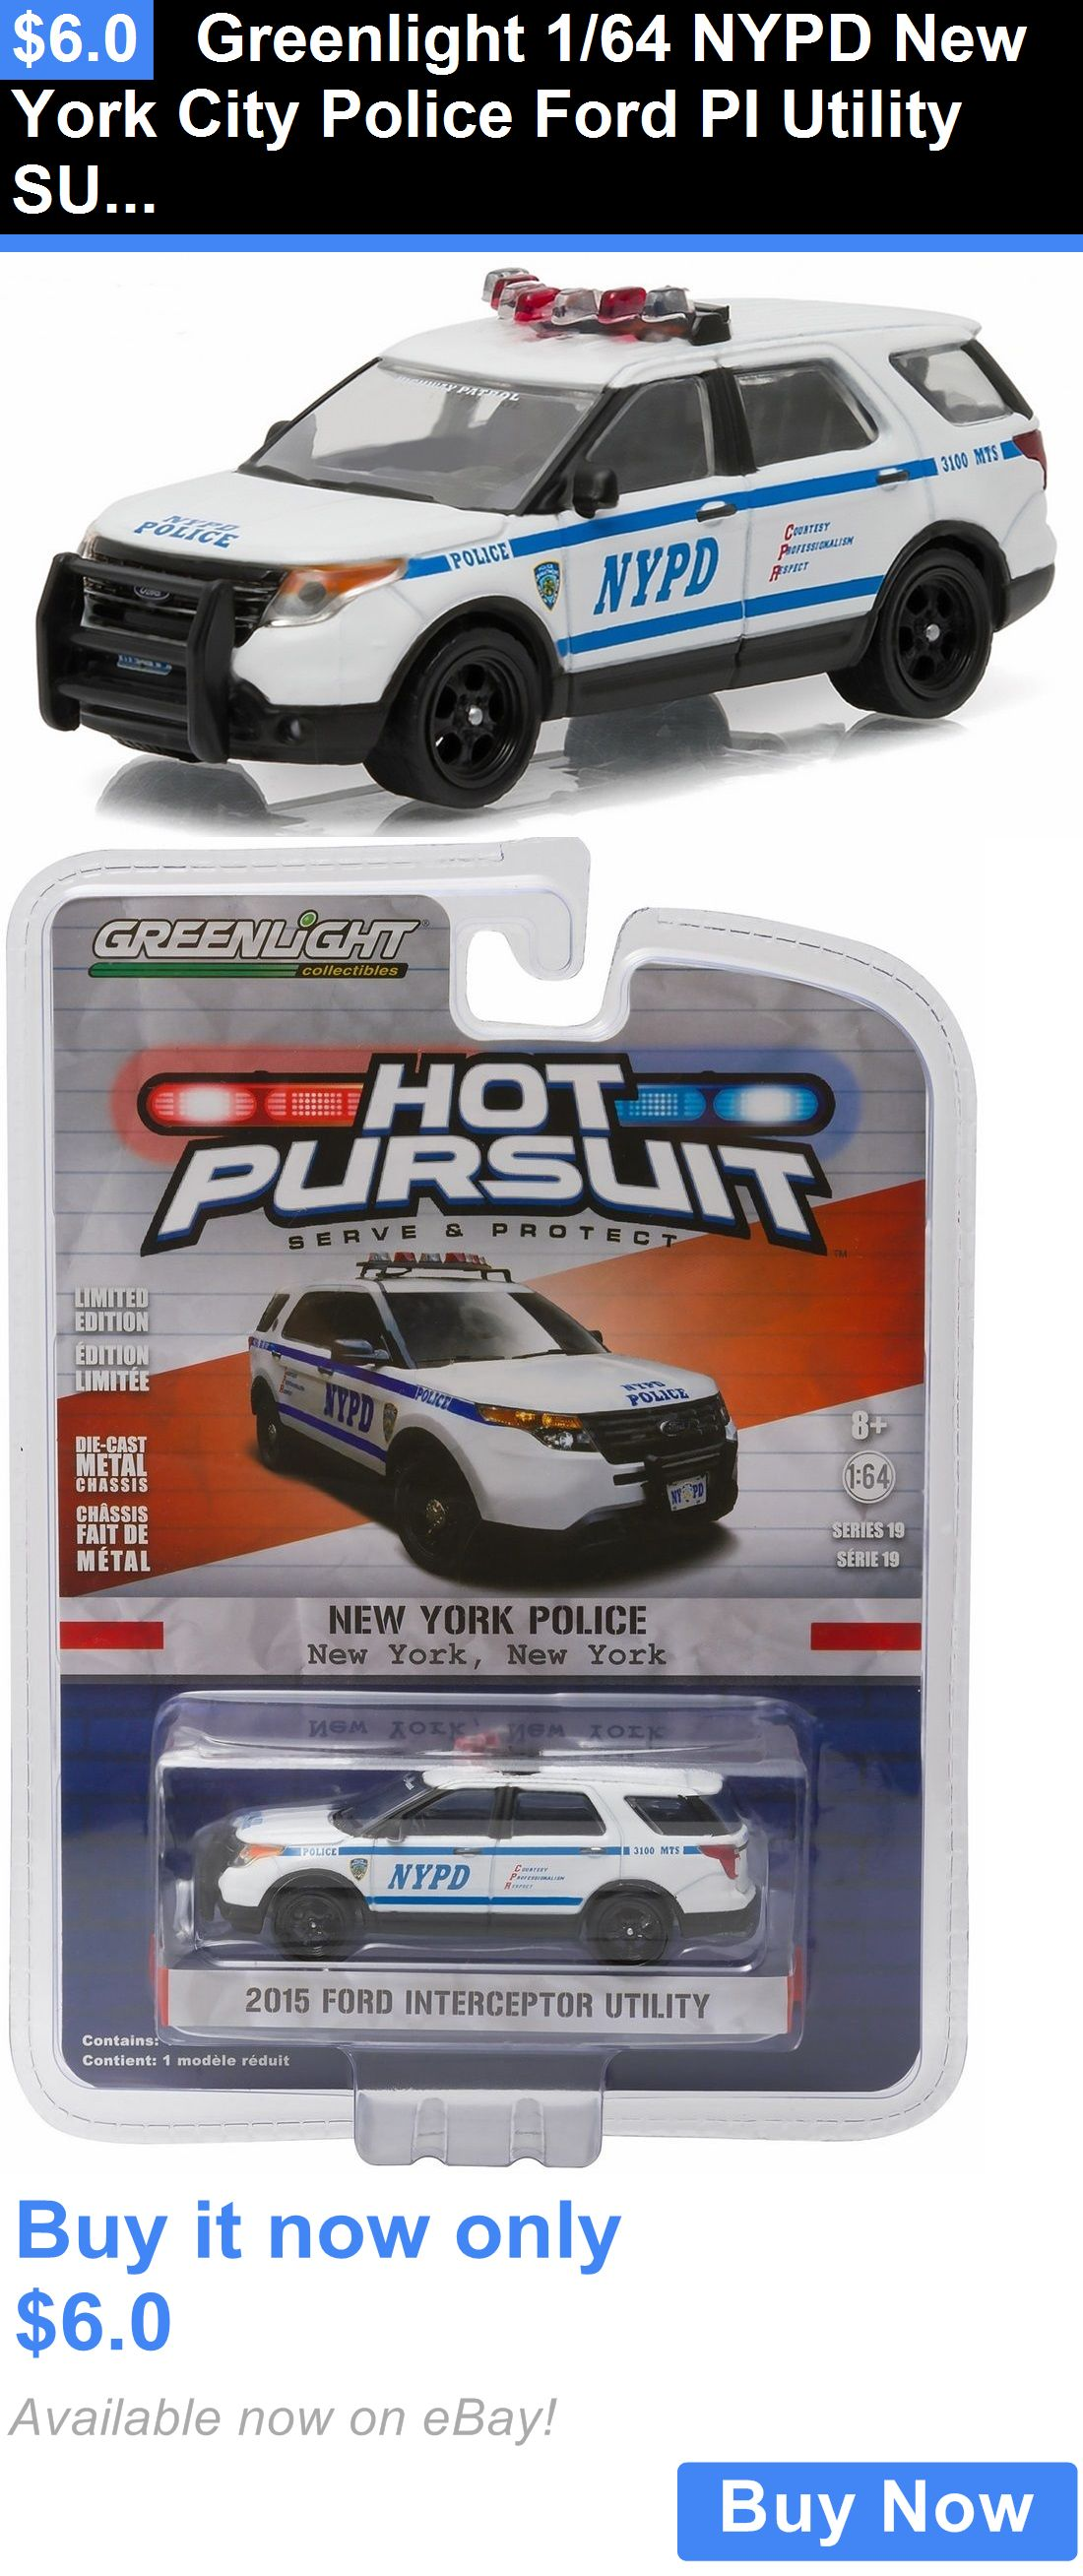 1:64 Greenlight 2016 Ford Police Interceptor Utility NYPD Diecast Car Model